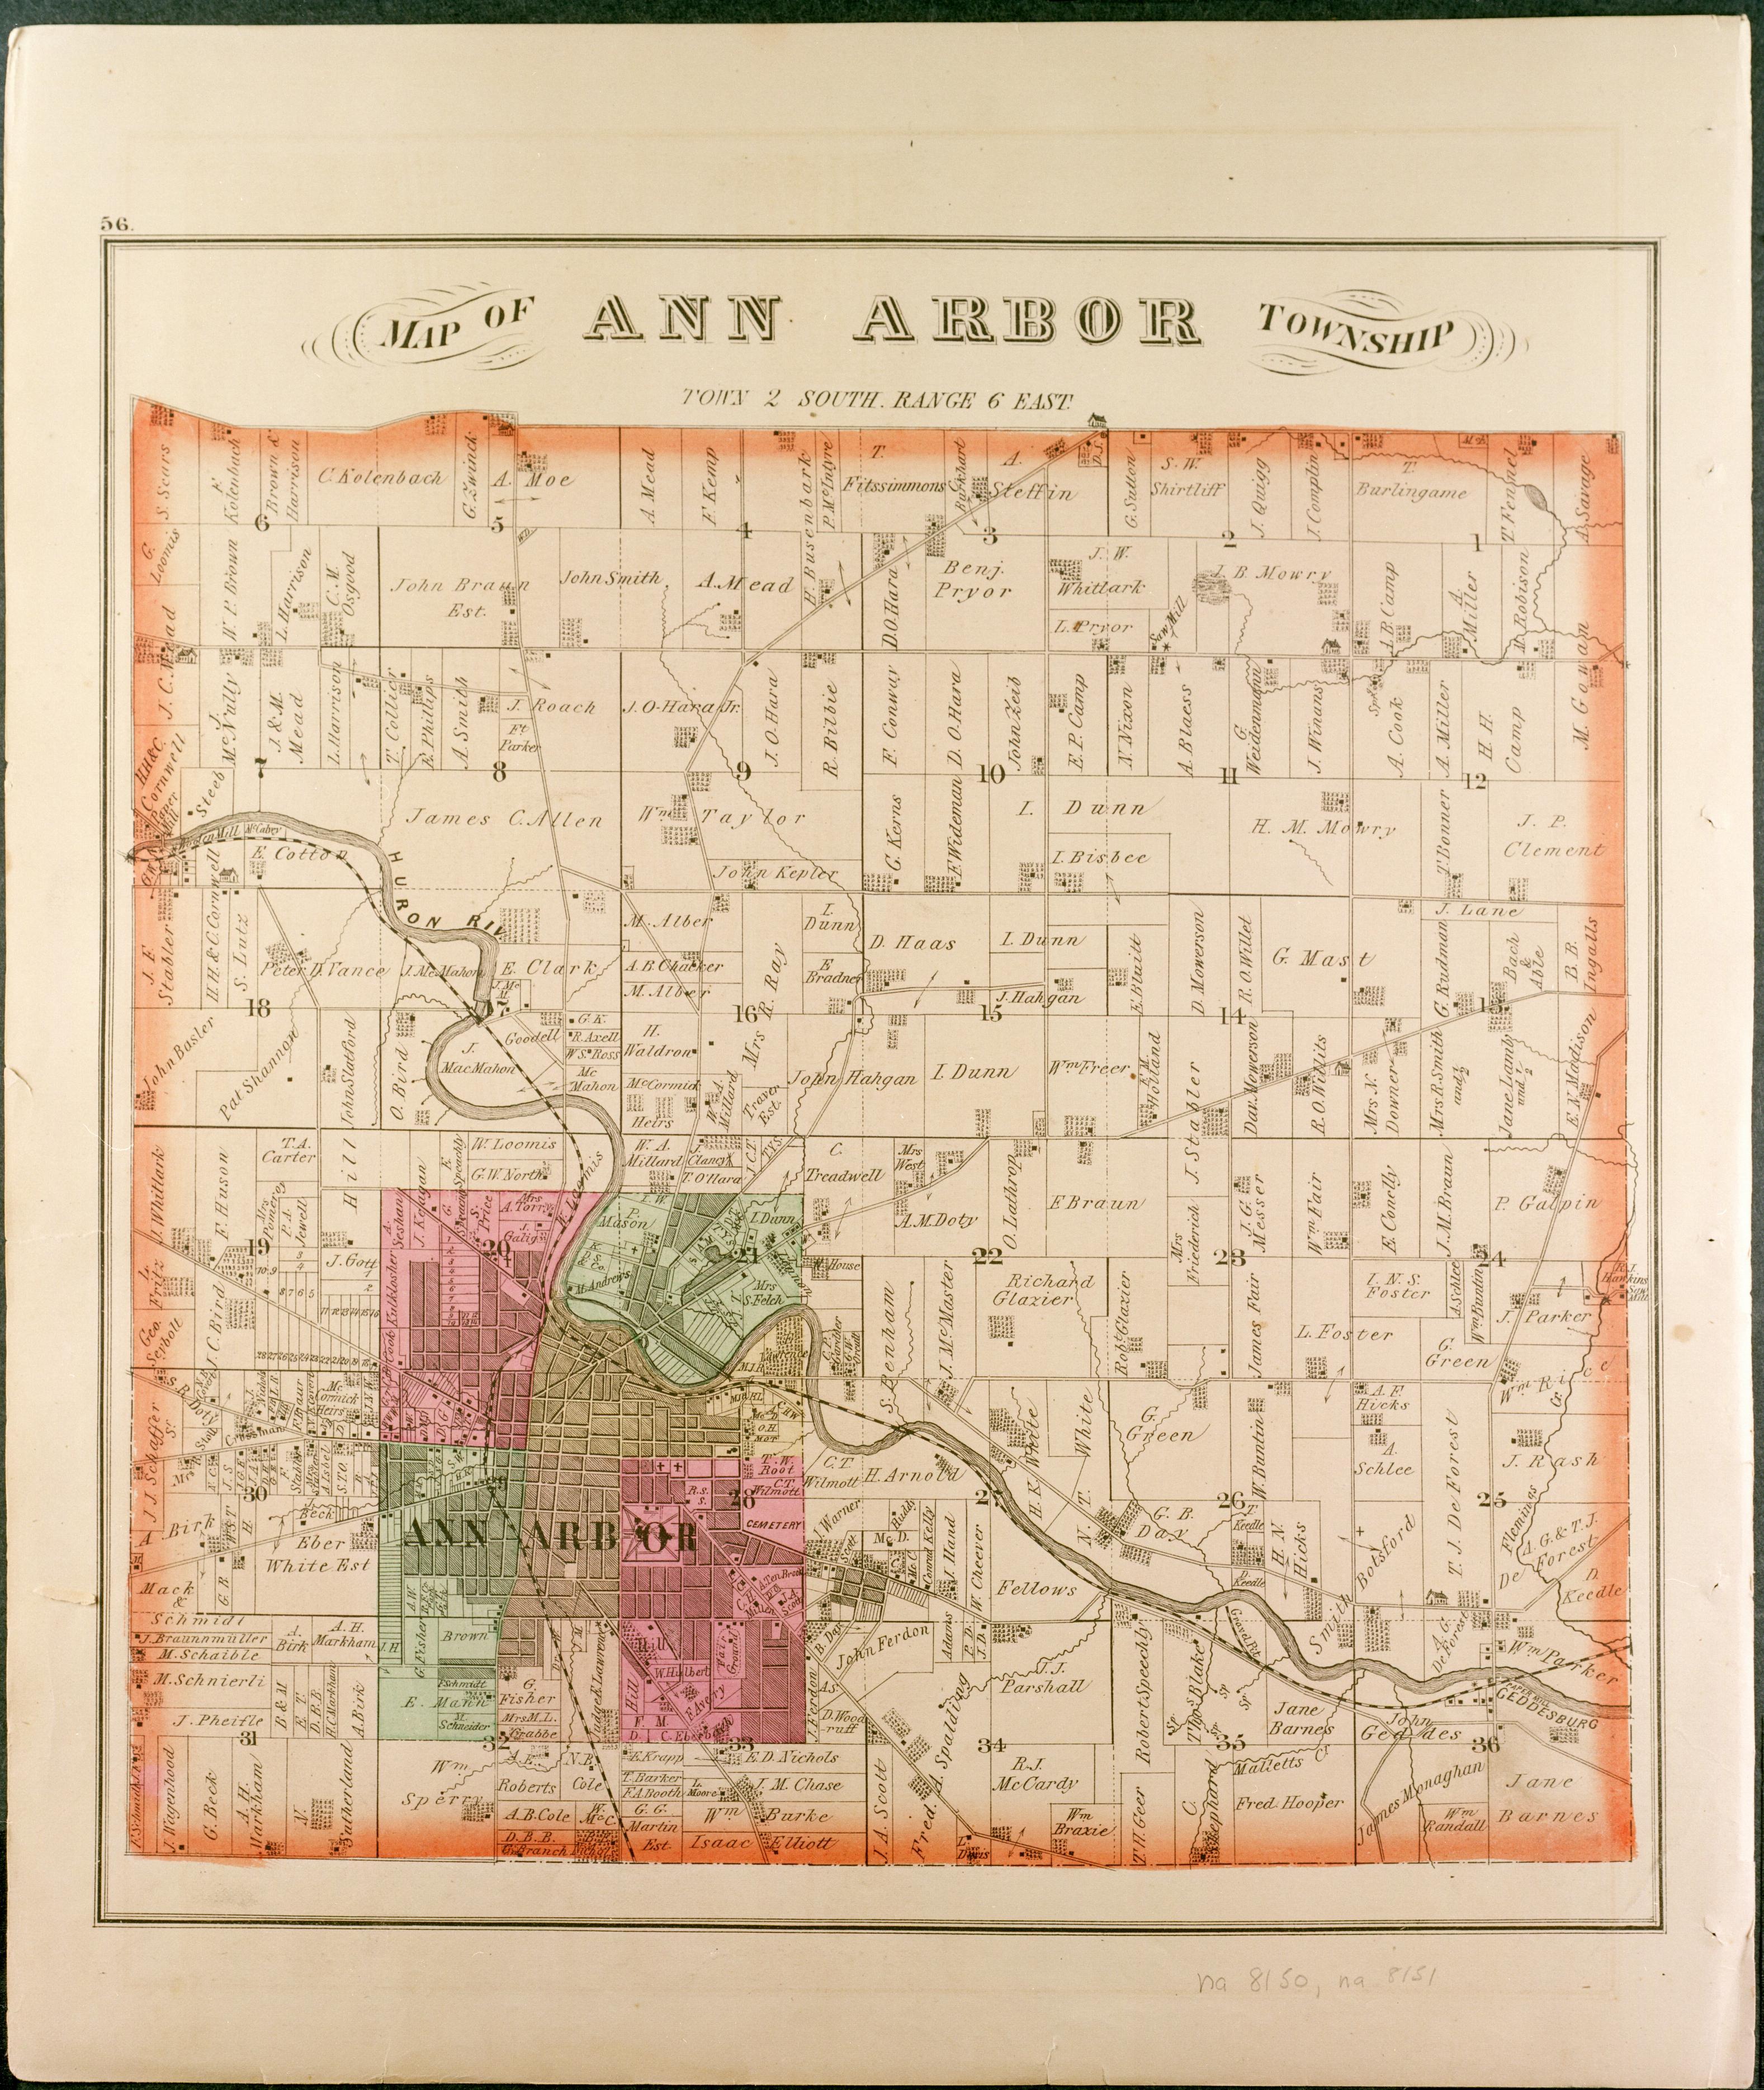 Pictorial History Of Ann Arbor Map Of Ann Arbor Township Town - Ann arbor map